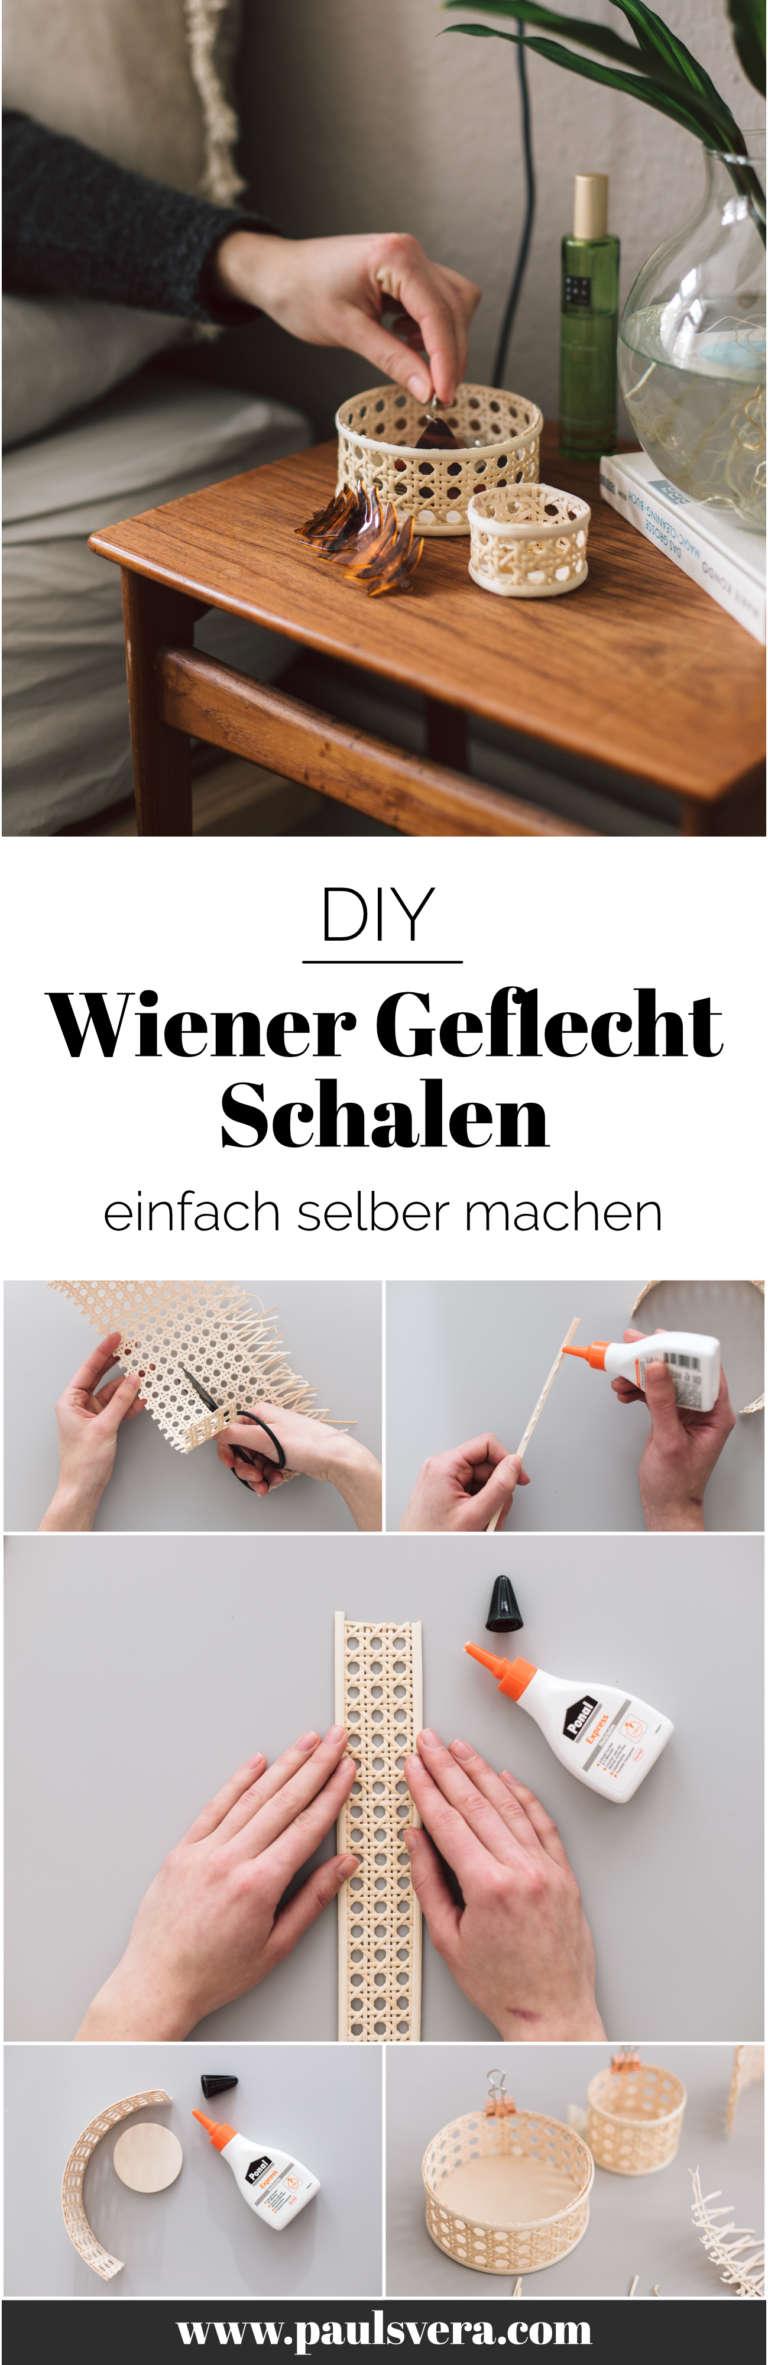 Wiener Geflecht Korb Schale Selber Machen Anleitung Diy Paulsvera